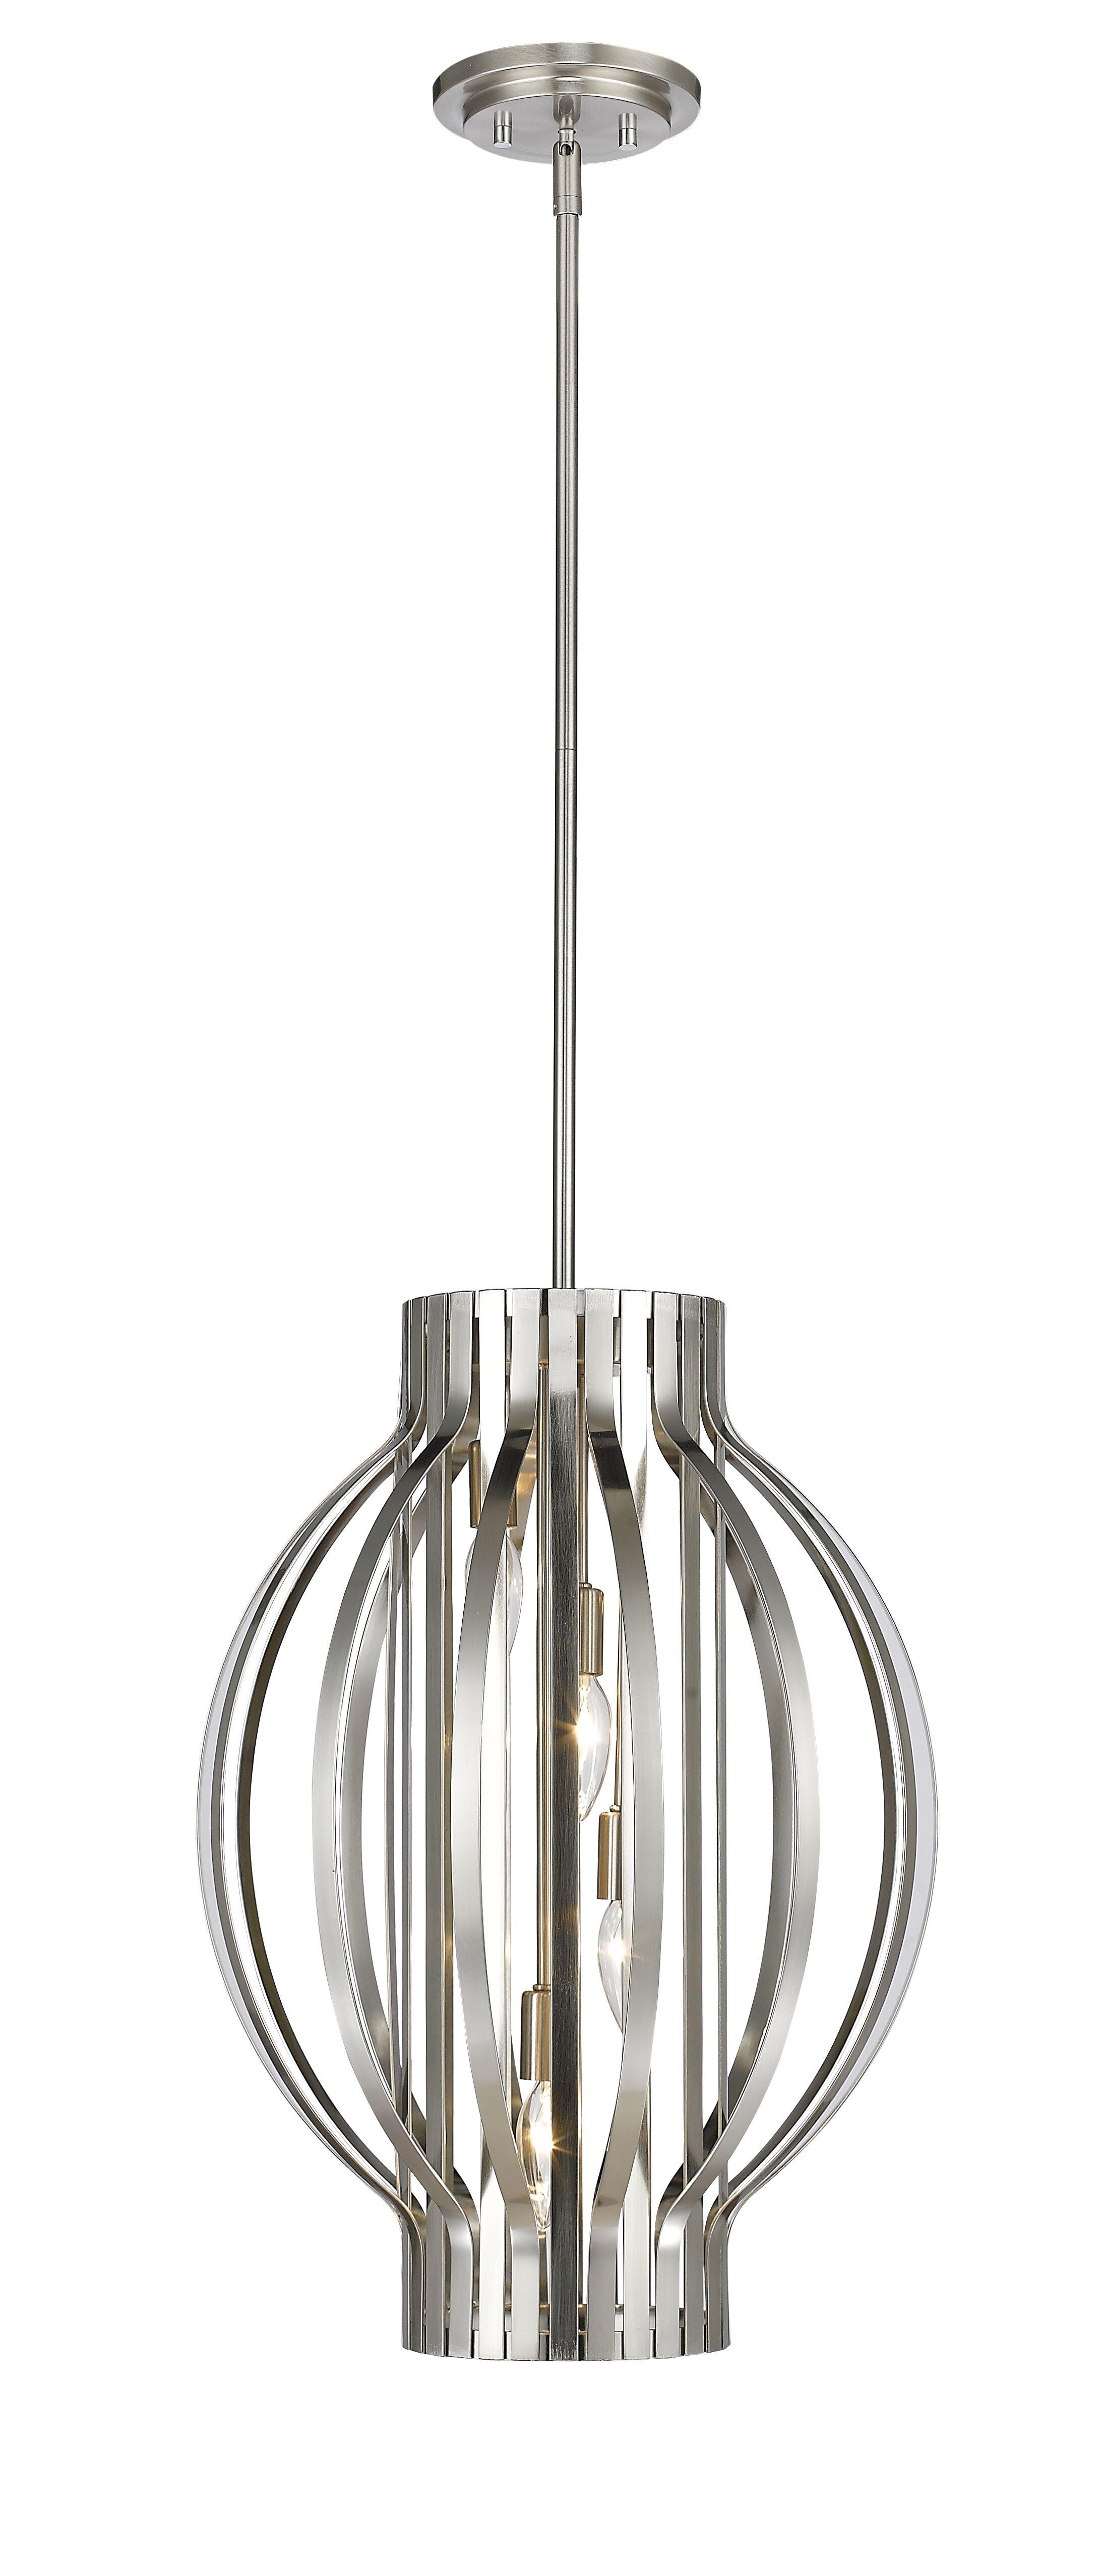 Fava 4-Light Globe Chandelier Finish: Brushed Nickel